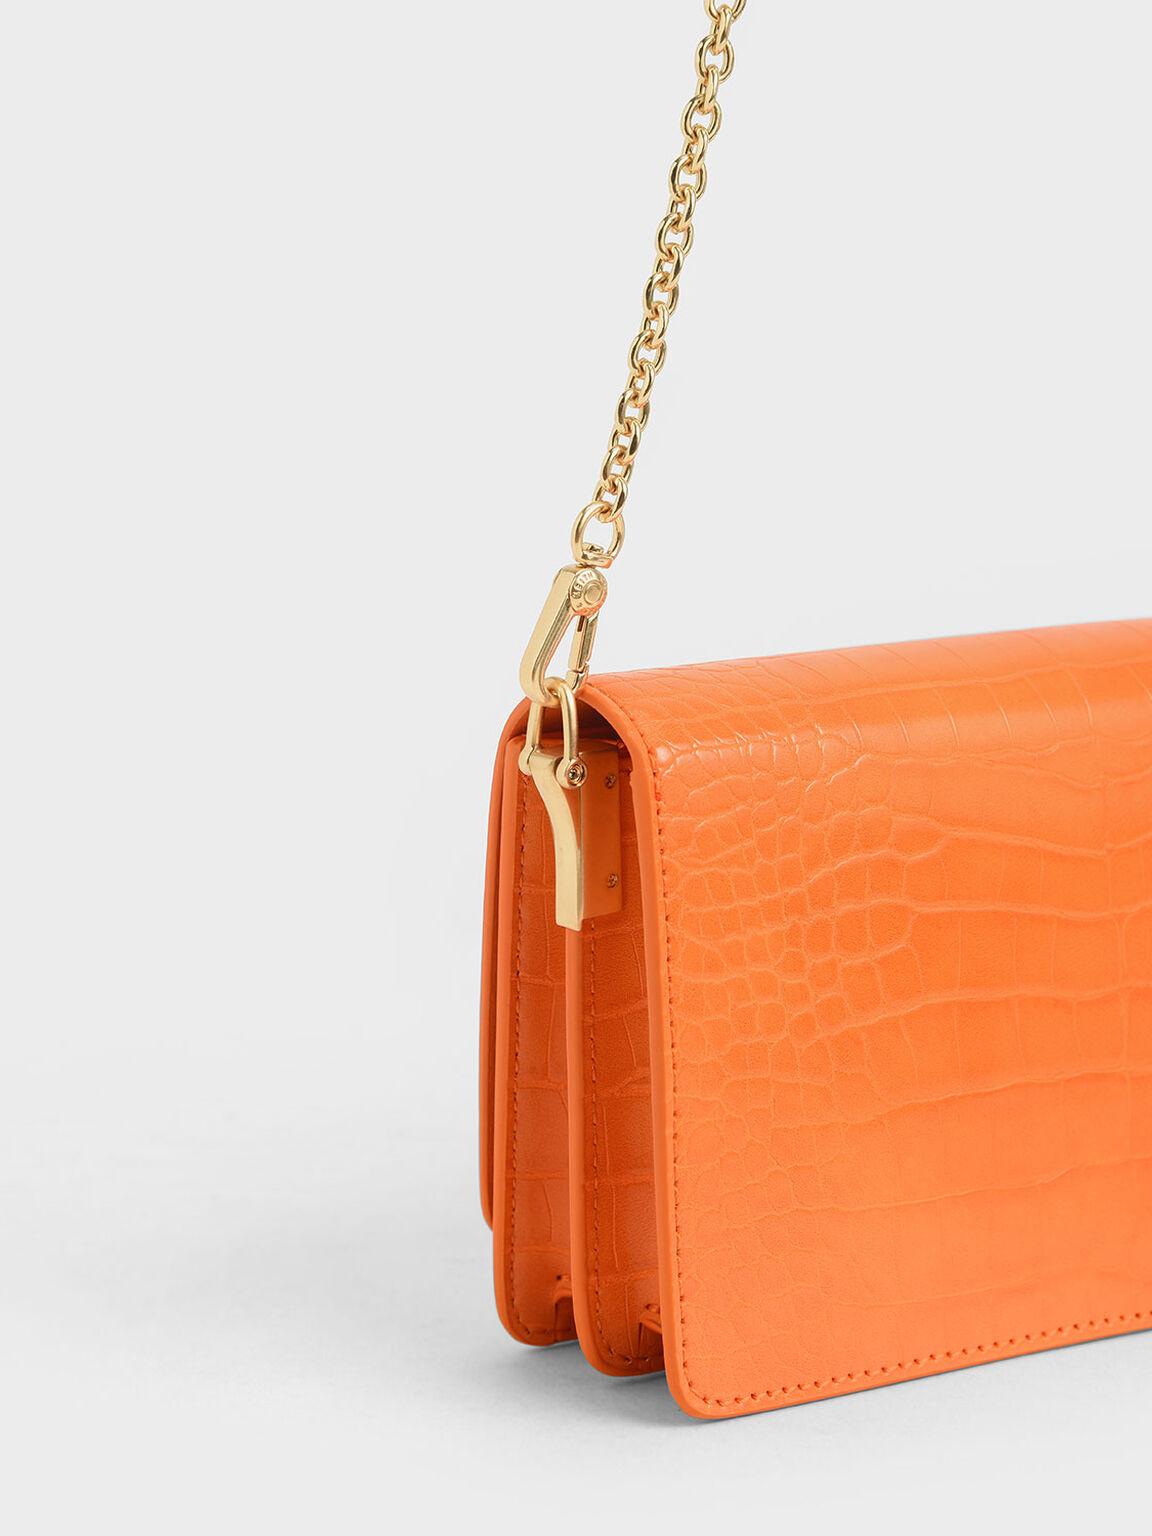 鱷魚紋手拿包, 橘色, hi-res